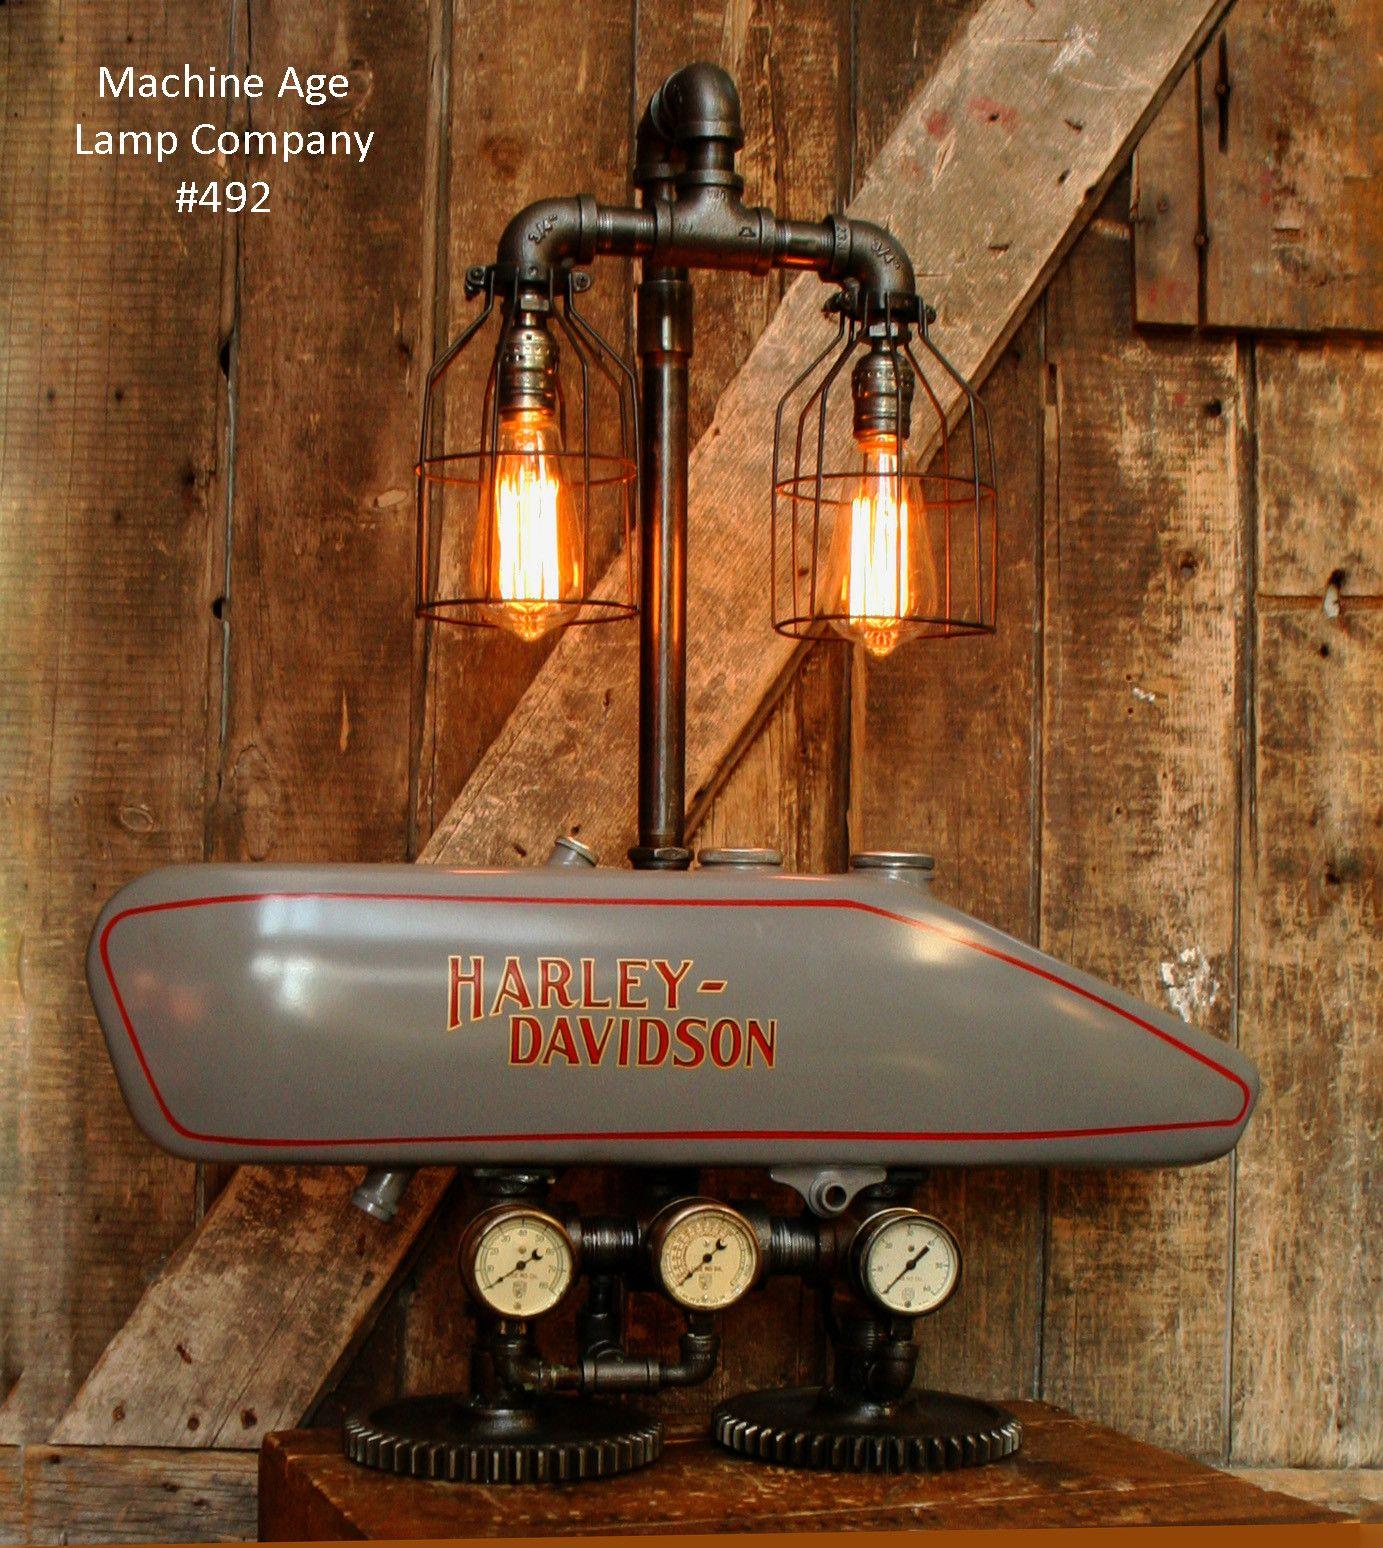 10 Reasons To Buy Harley Davidson Motorcycle Lamp